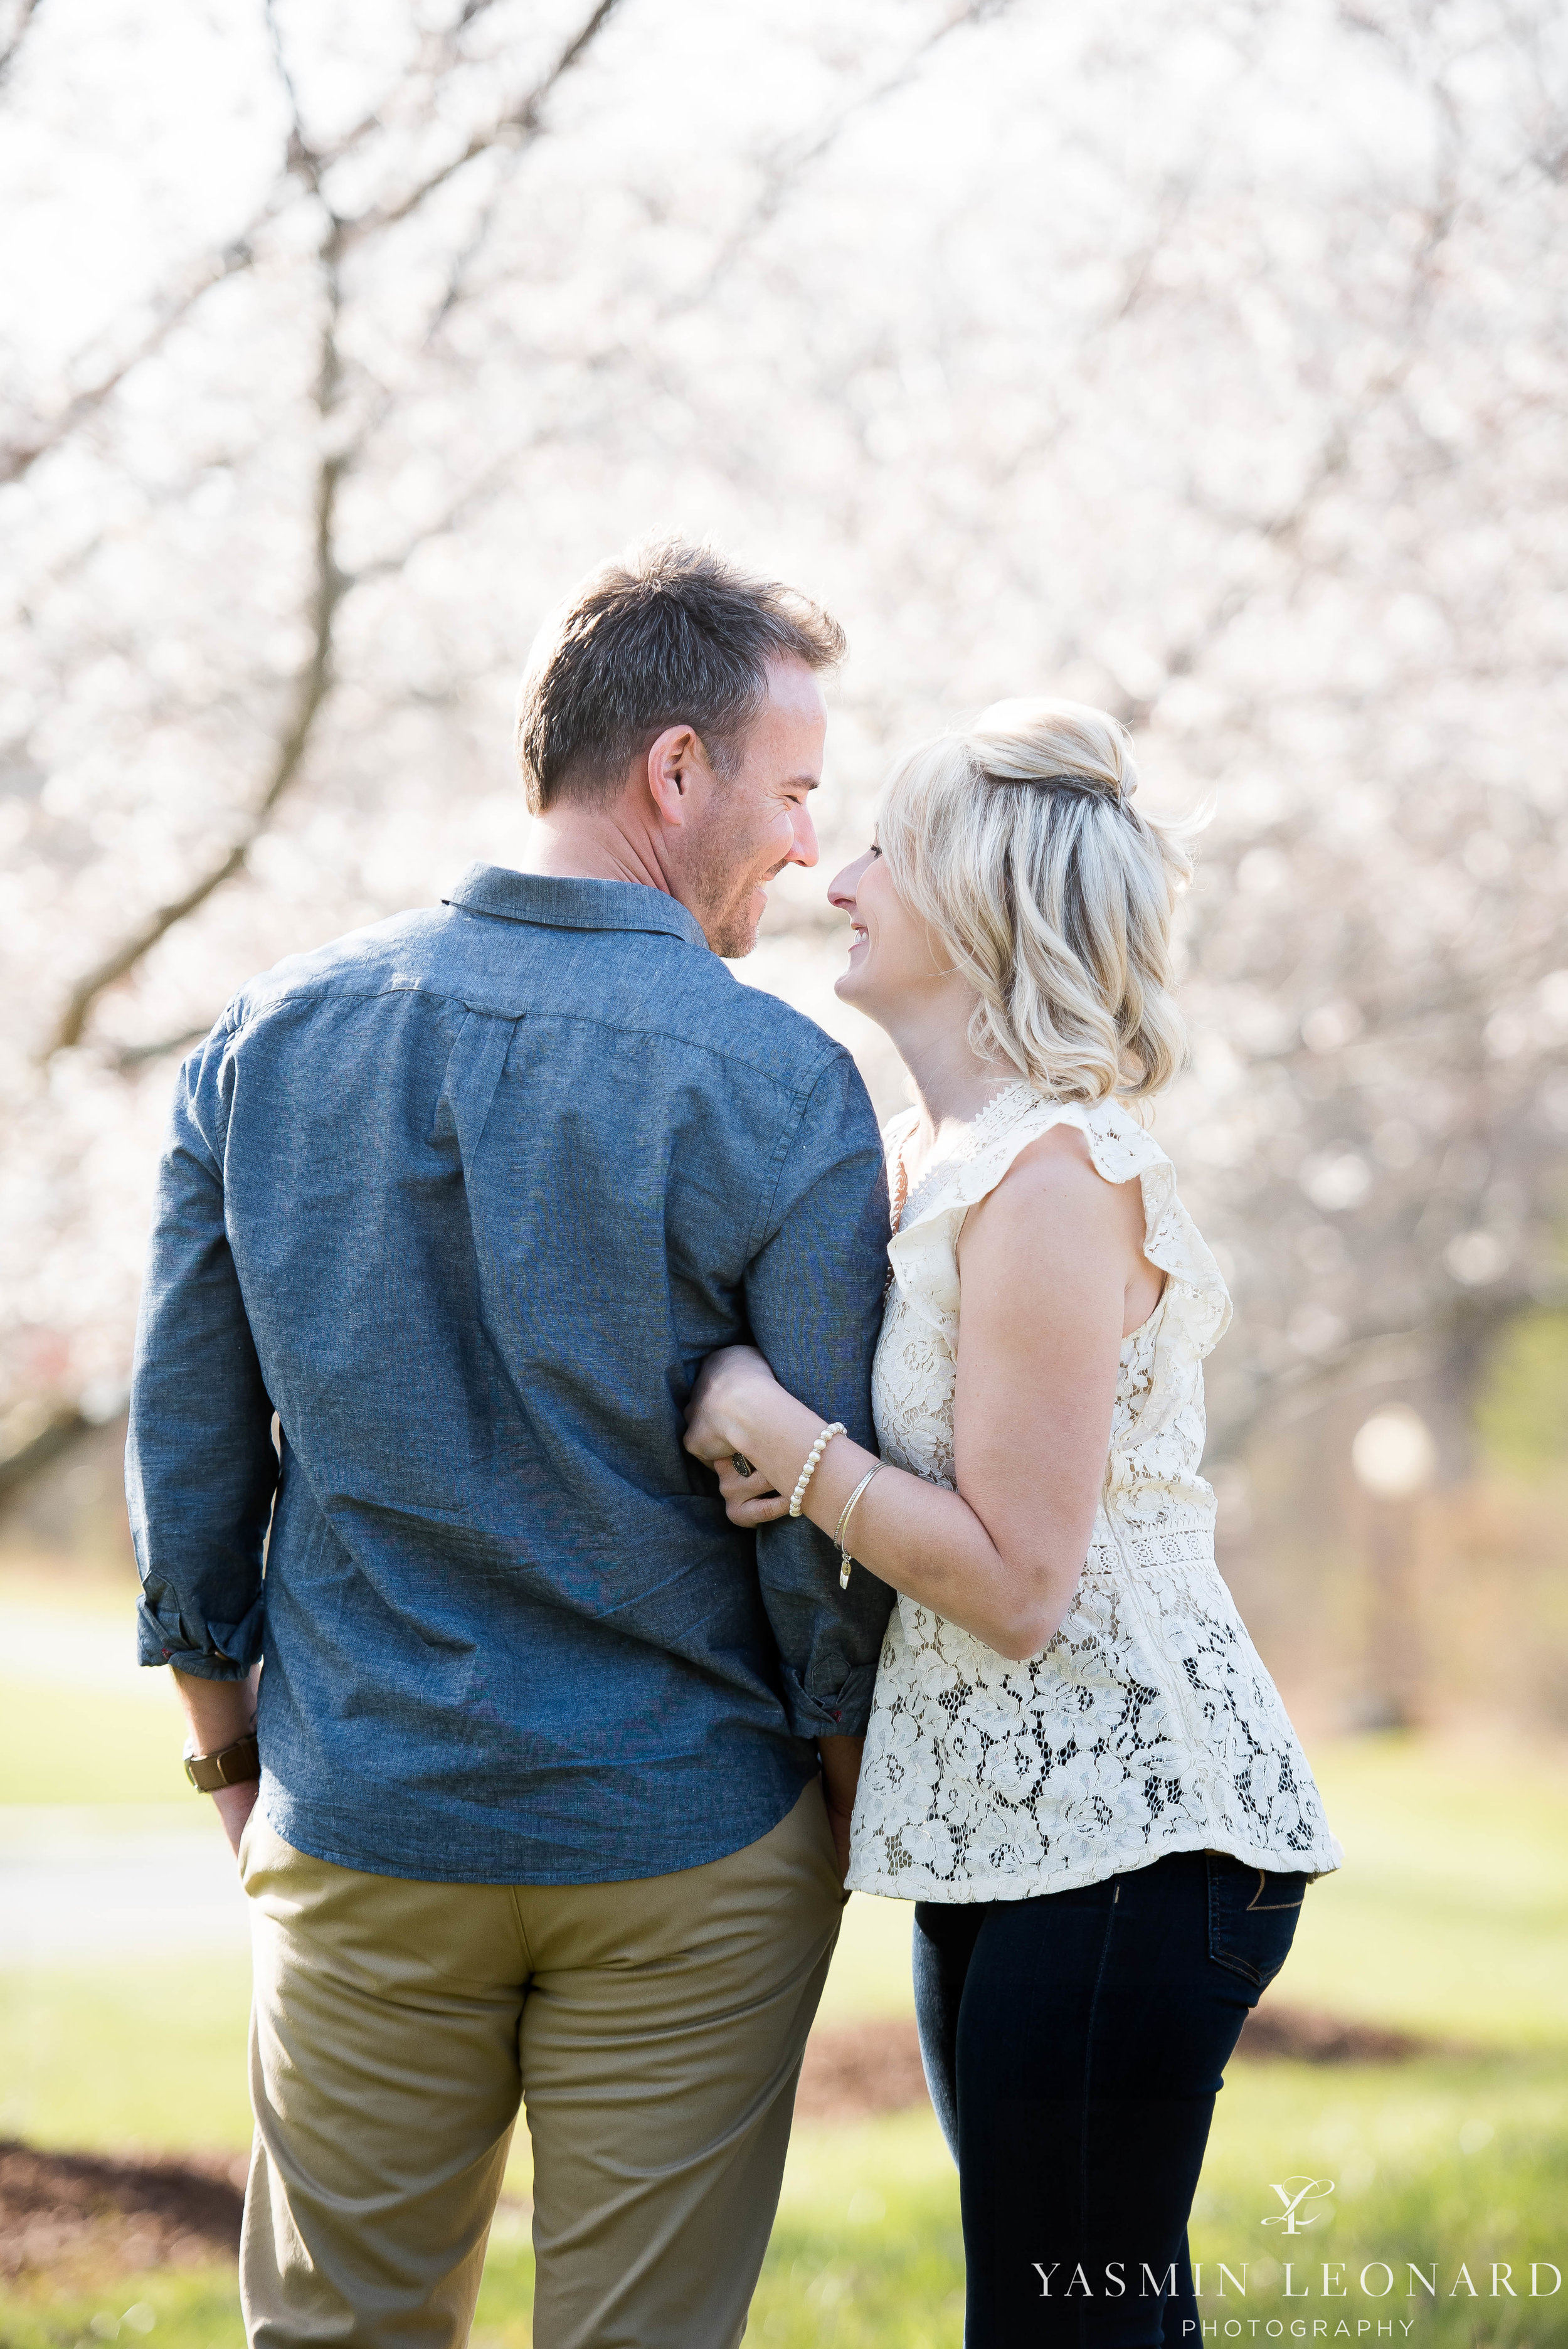 High Point Wedding Photographer - NC Wedding Photographer - Yasmin Leonard Photography - Engagement Poses - Engagement Ideas - Outdoor Engagement Session-10.jpg